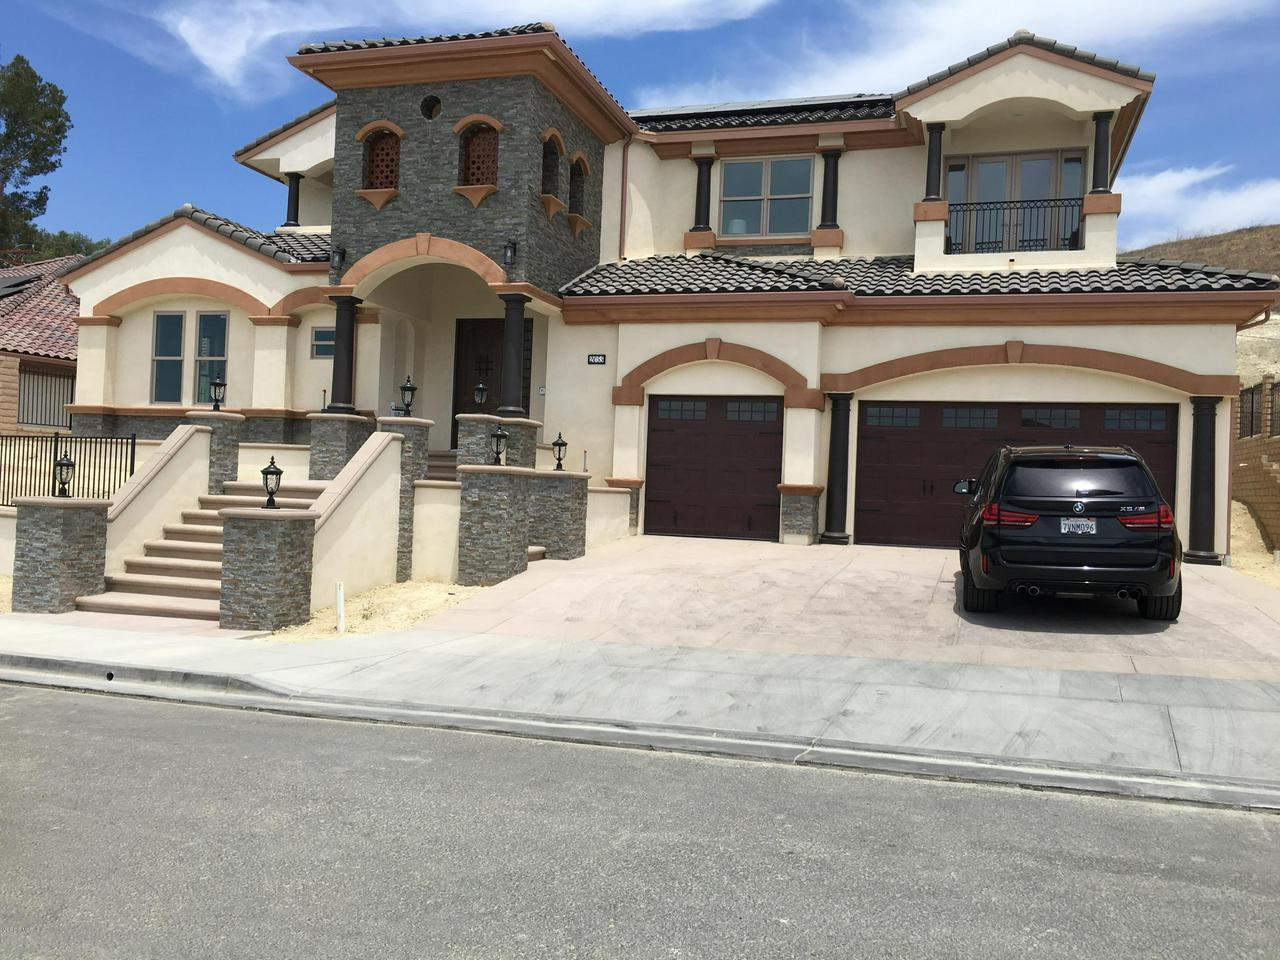 Photo of 2055 LONESTAR WAY, Thousand Oaks, CA 91362